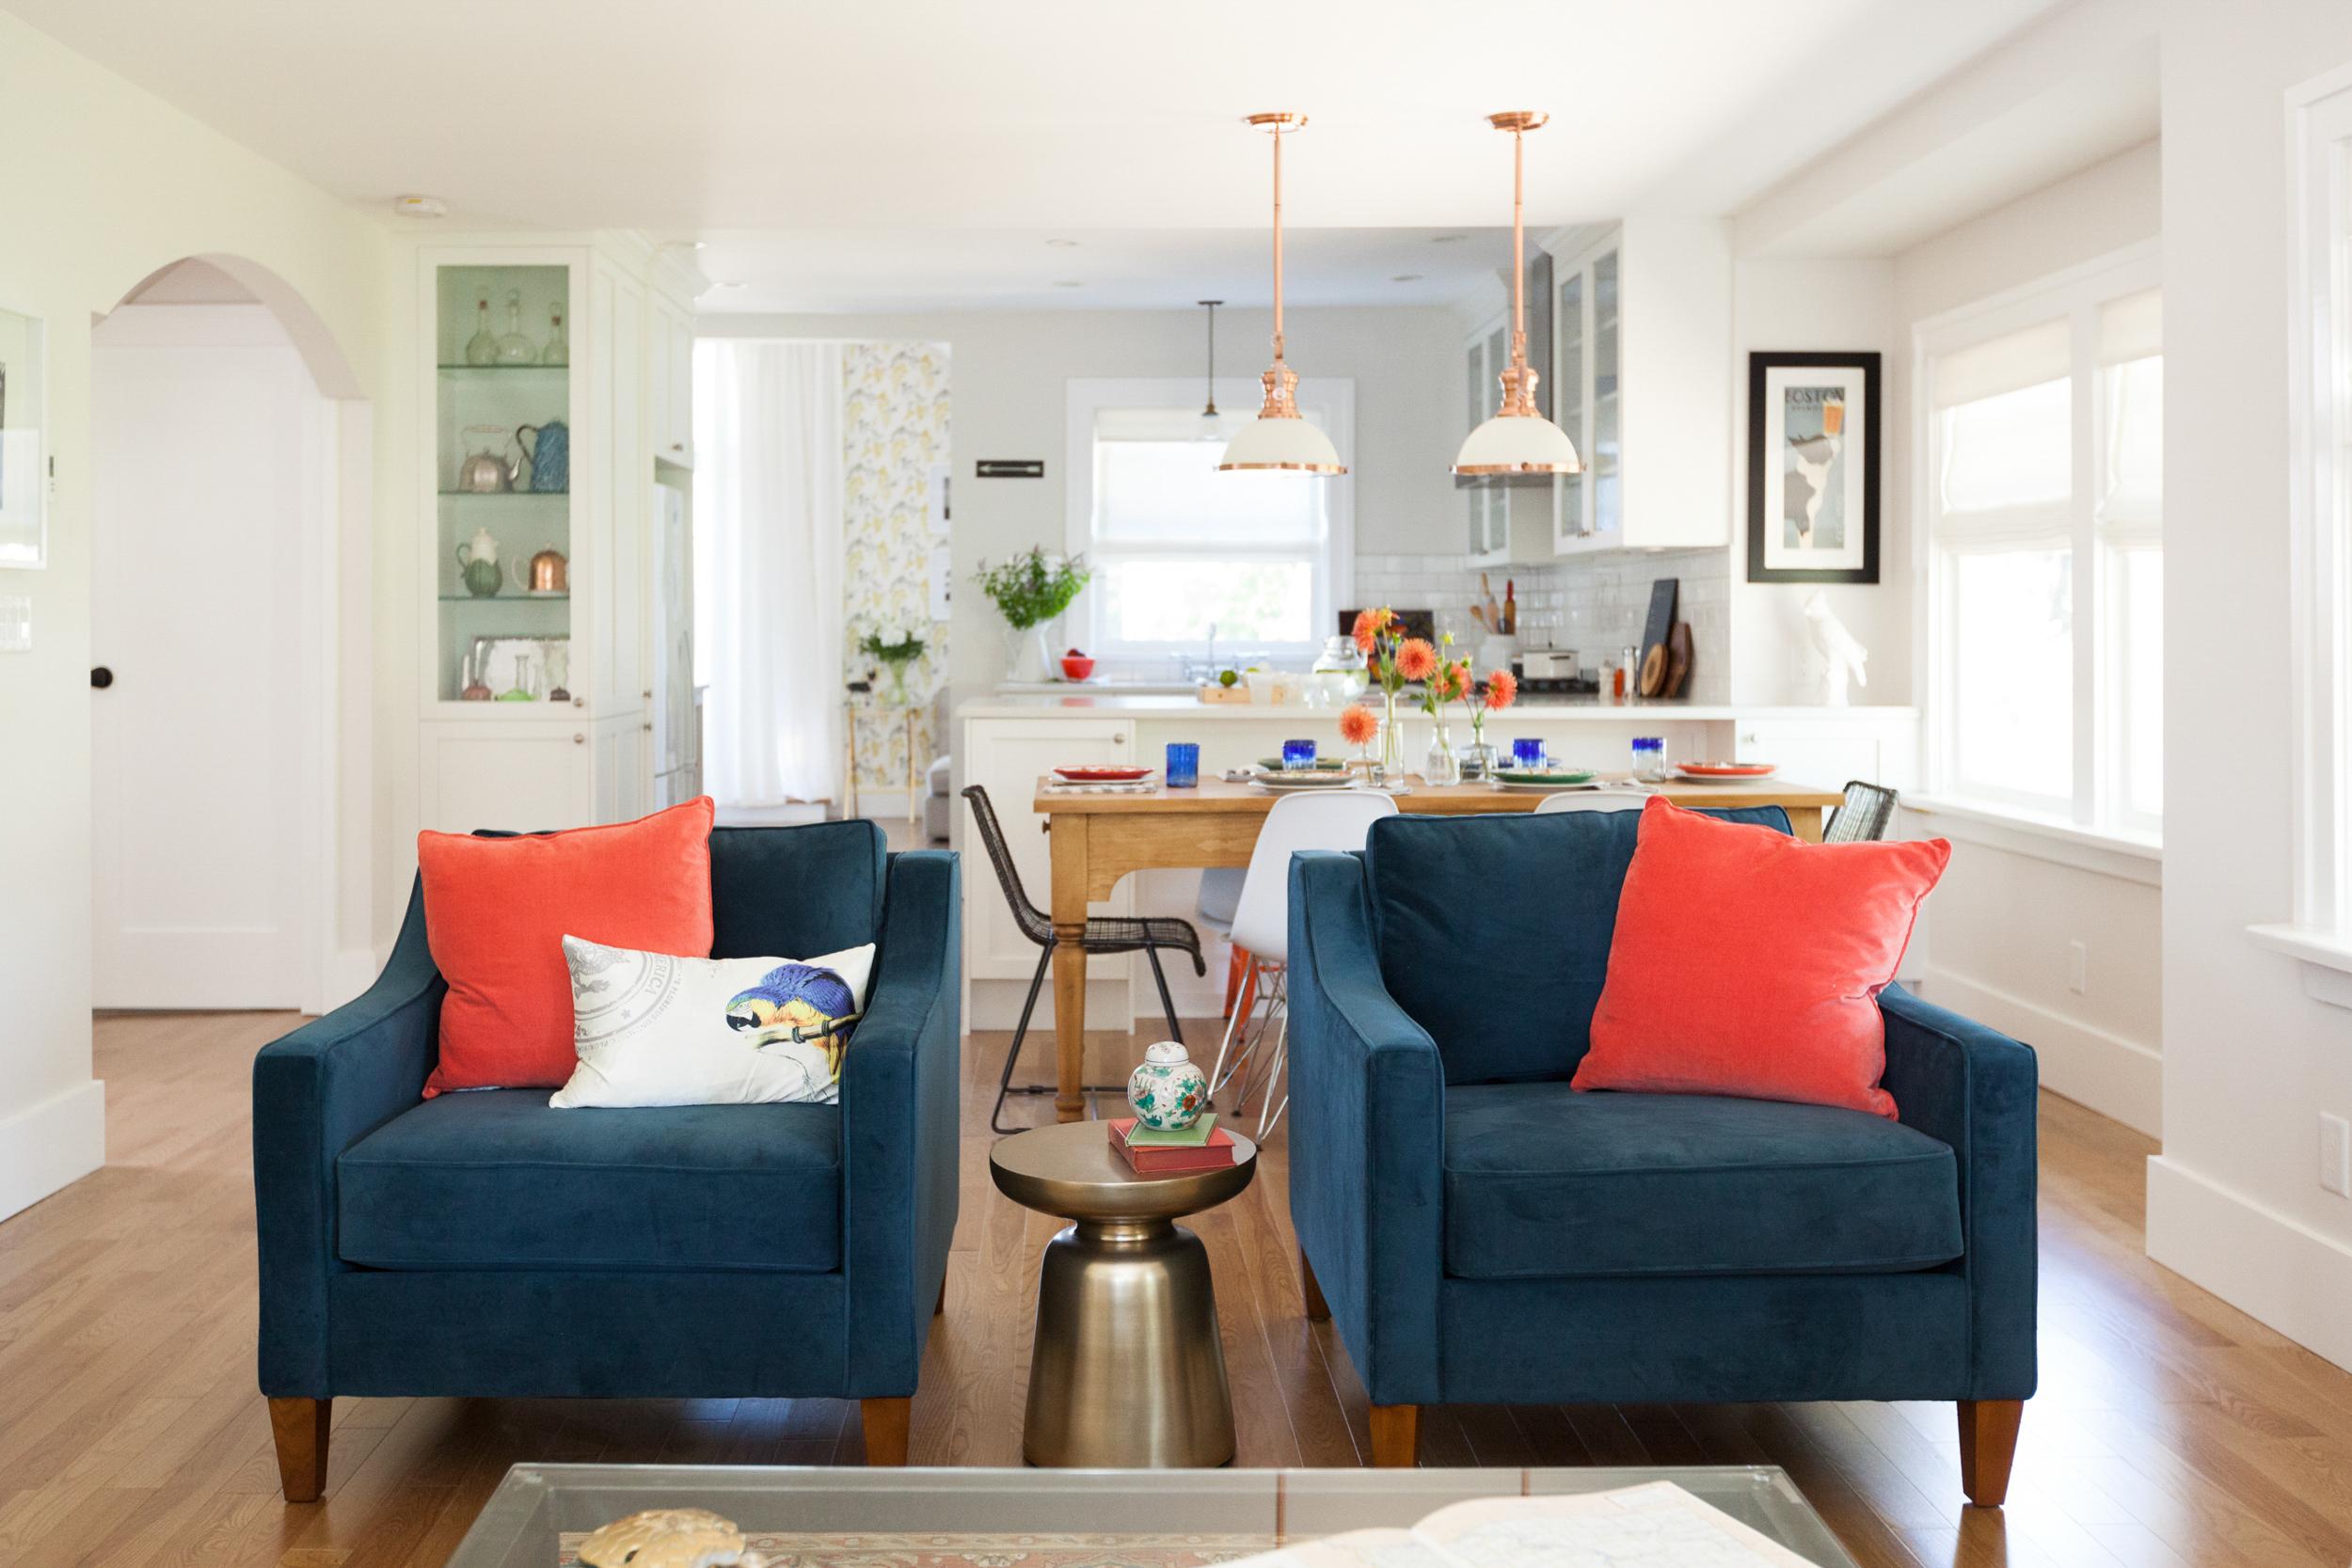 vancouver-interior-design-0019.jpg